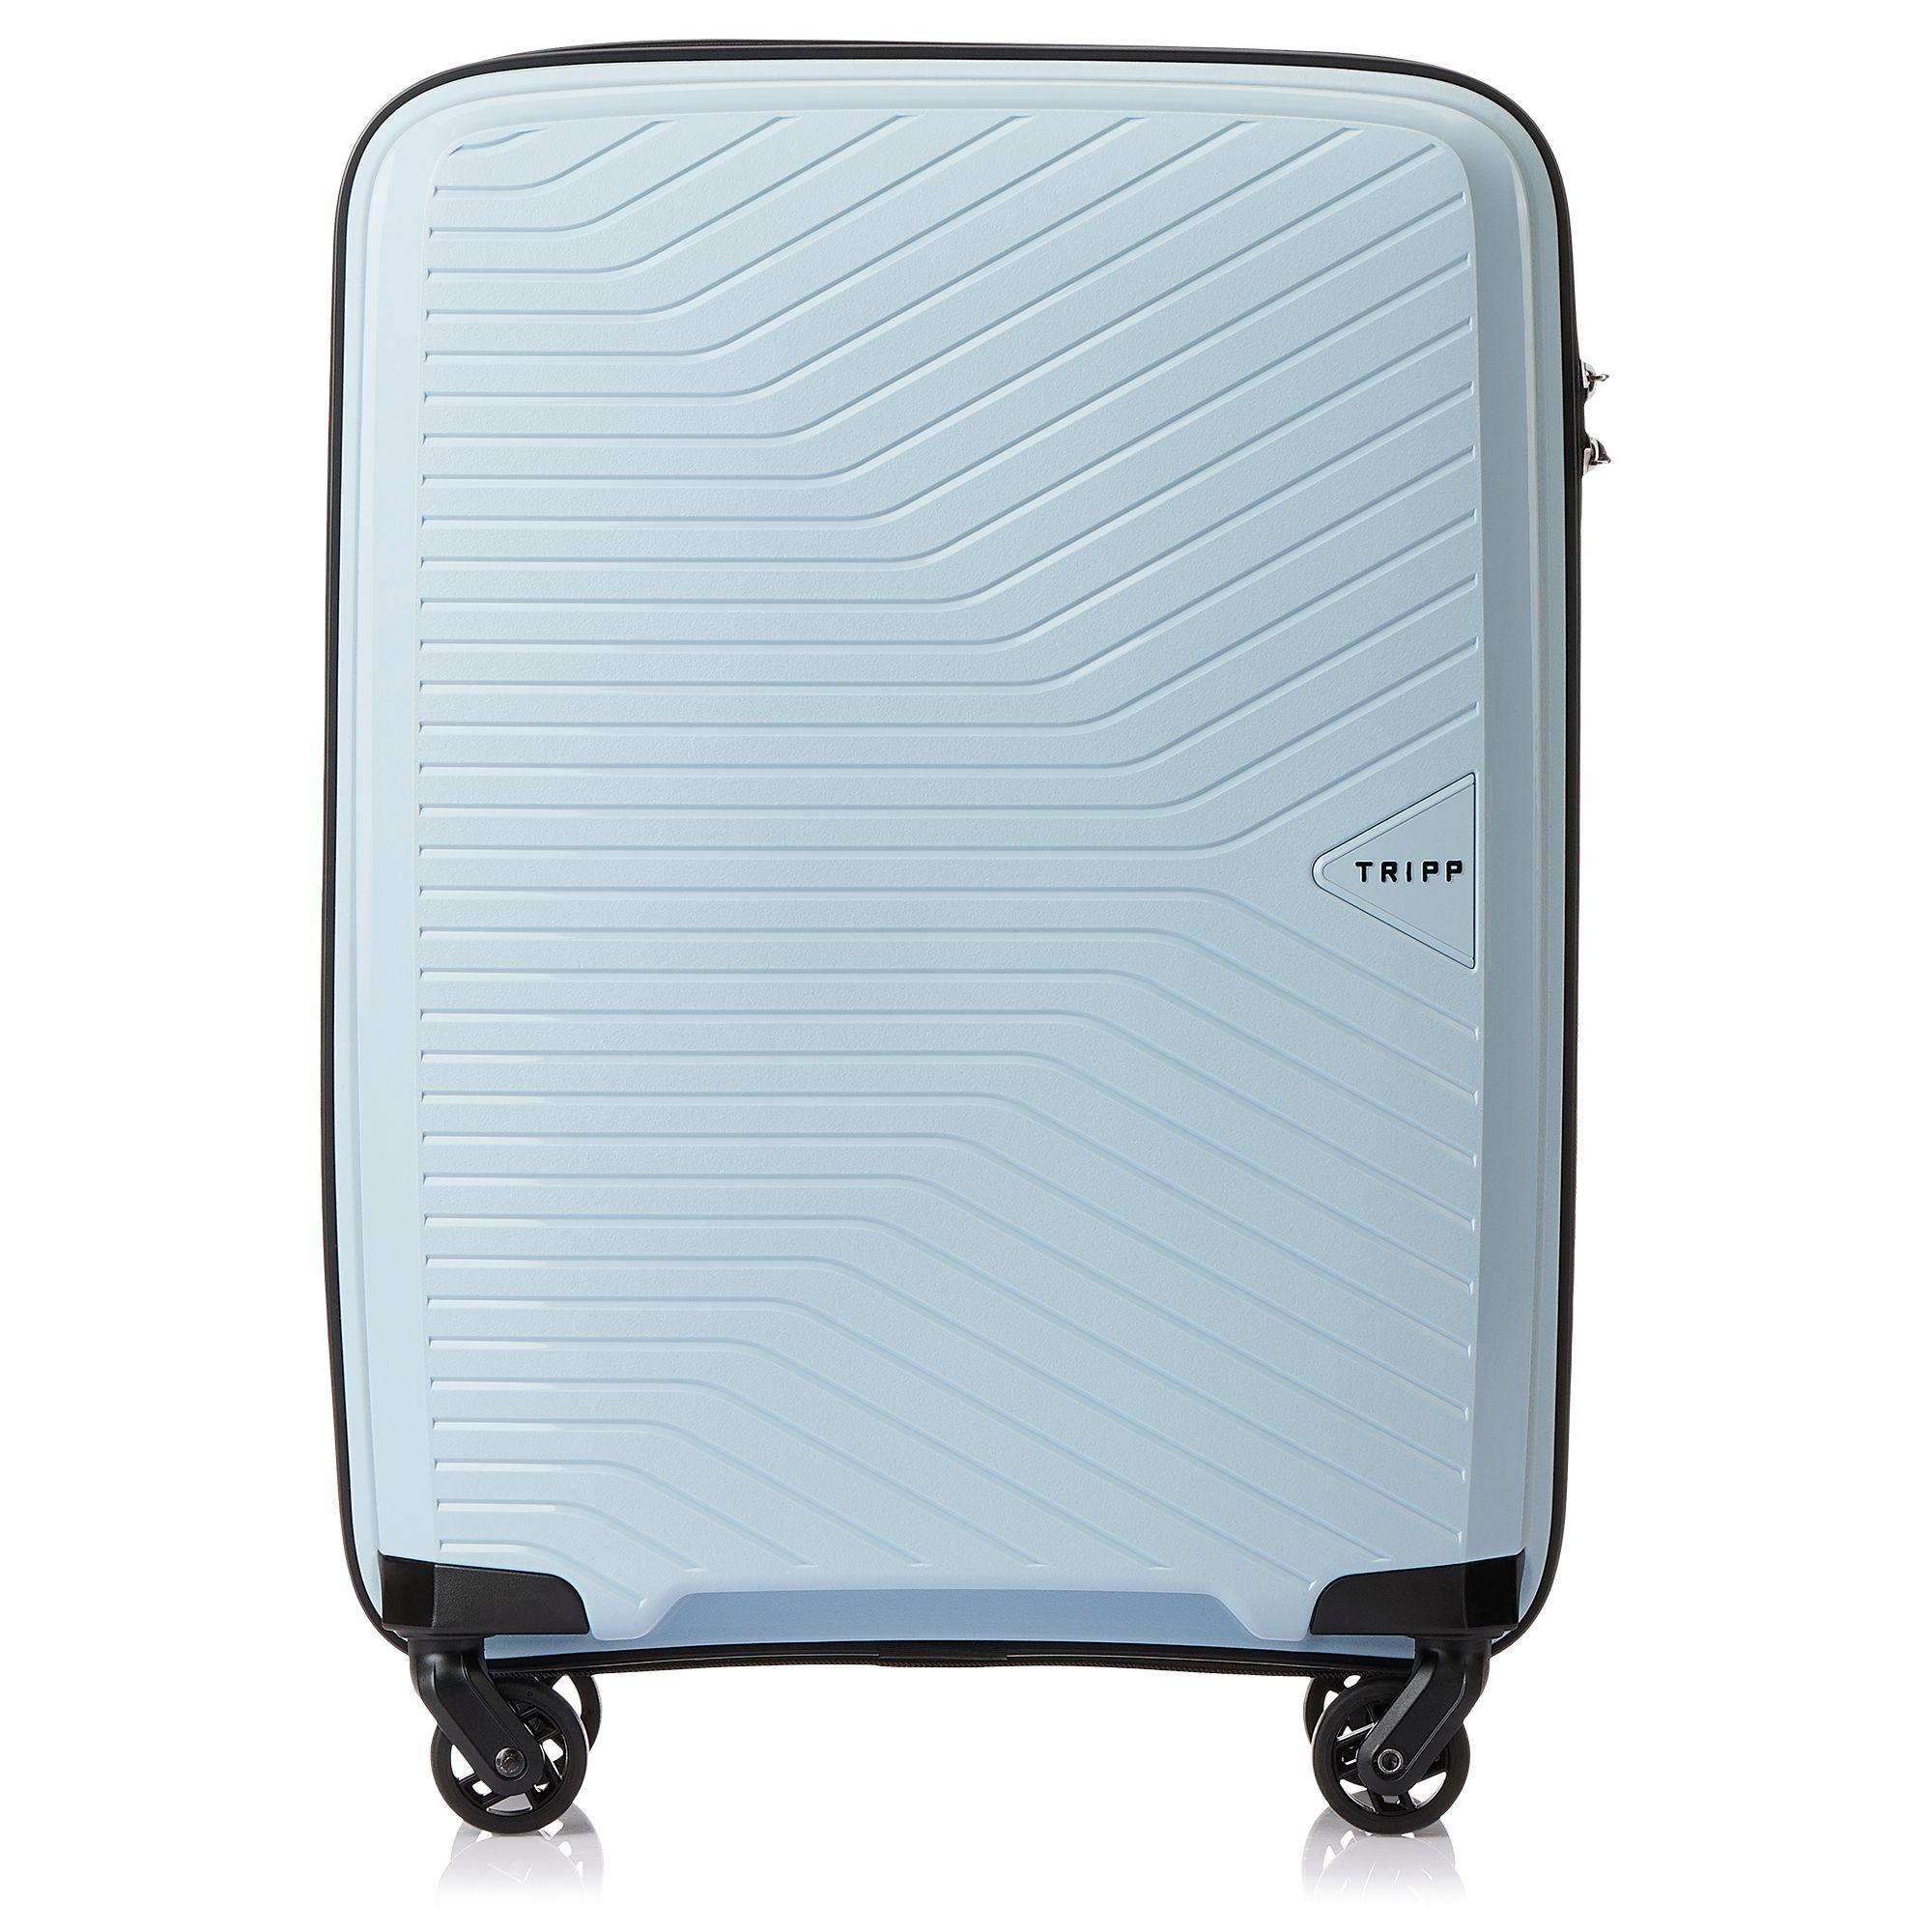 Tripp Ice Blue Chic Cabin 4 Wheel Suitcase Hard